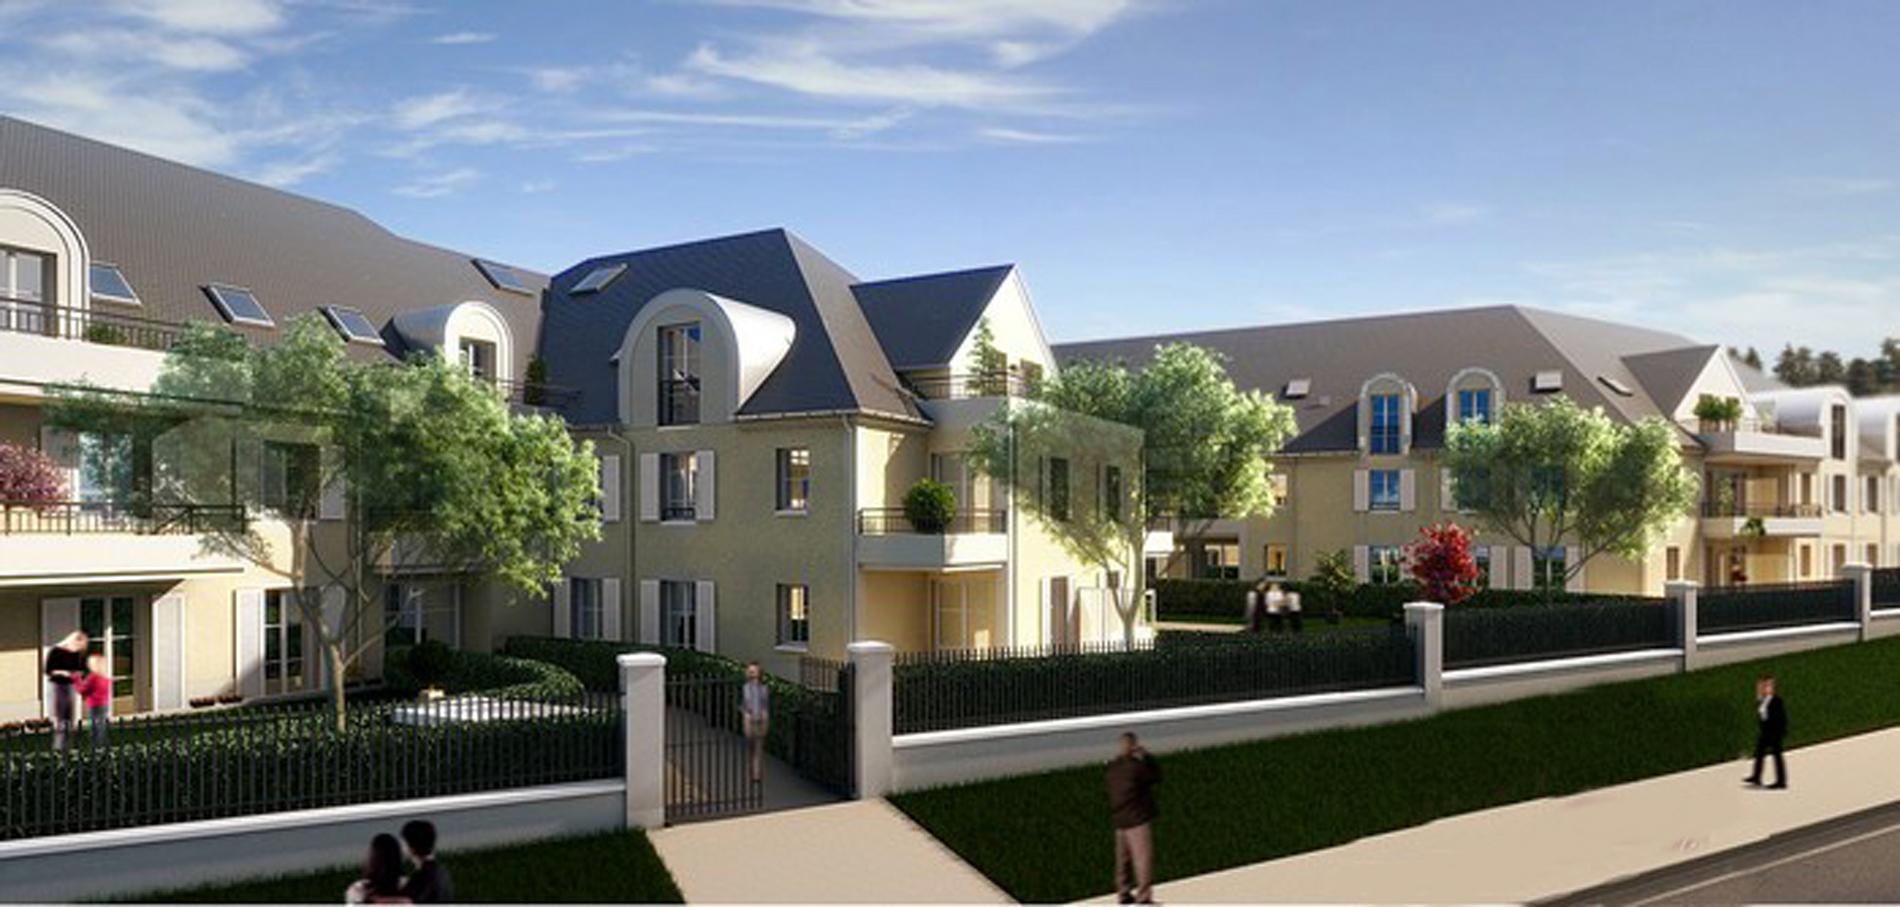 Residence_Clos_Saint_Louis_11